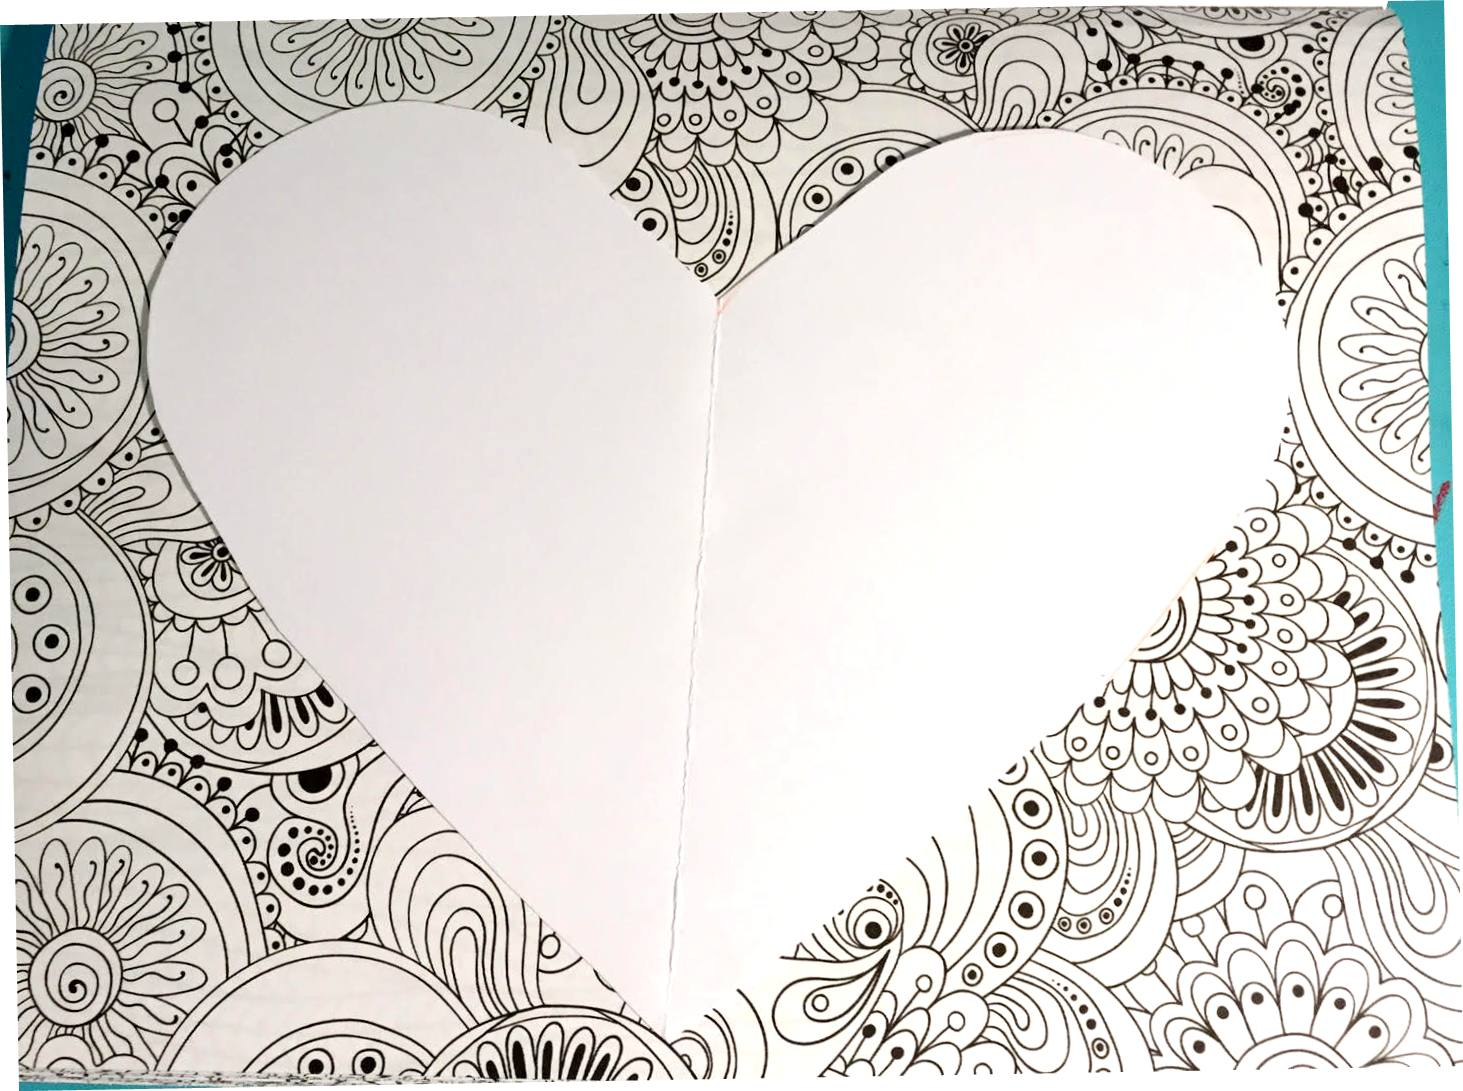 faerie dust dreams coloring hearts